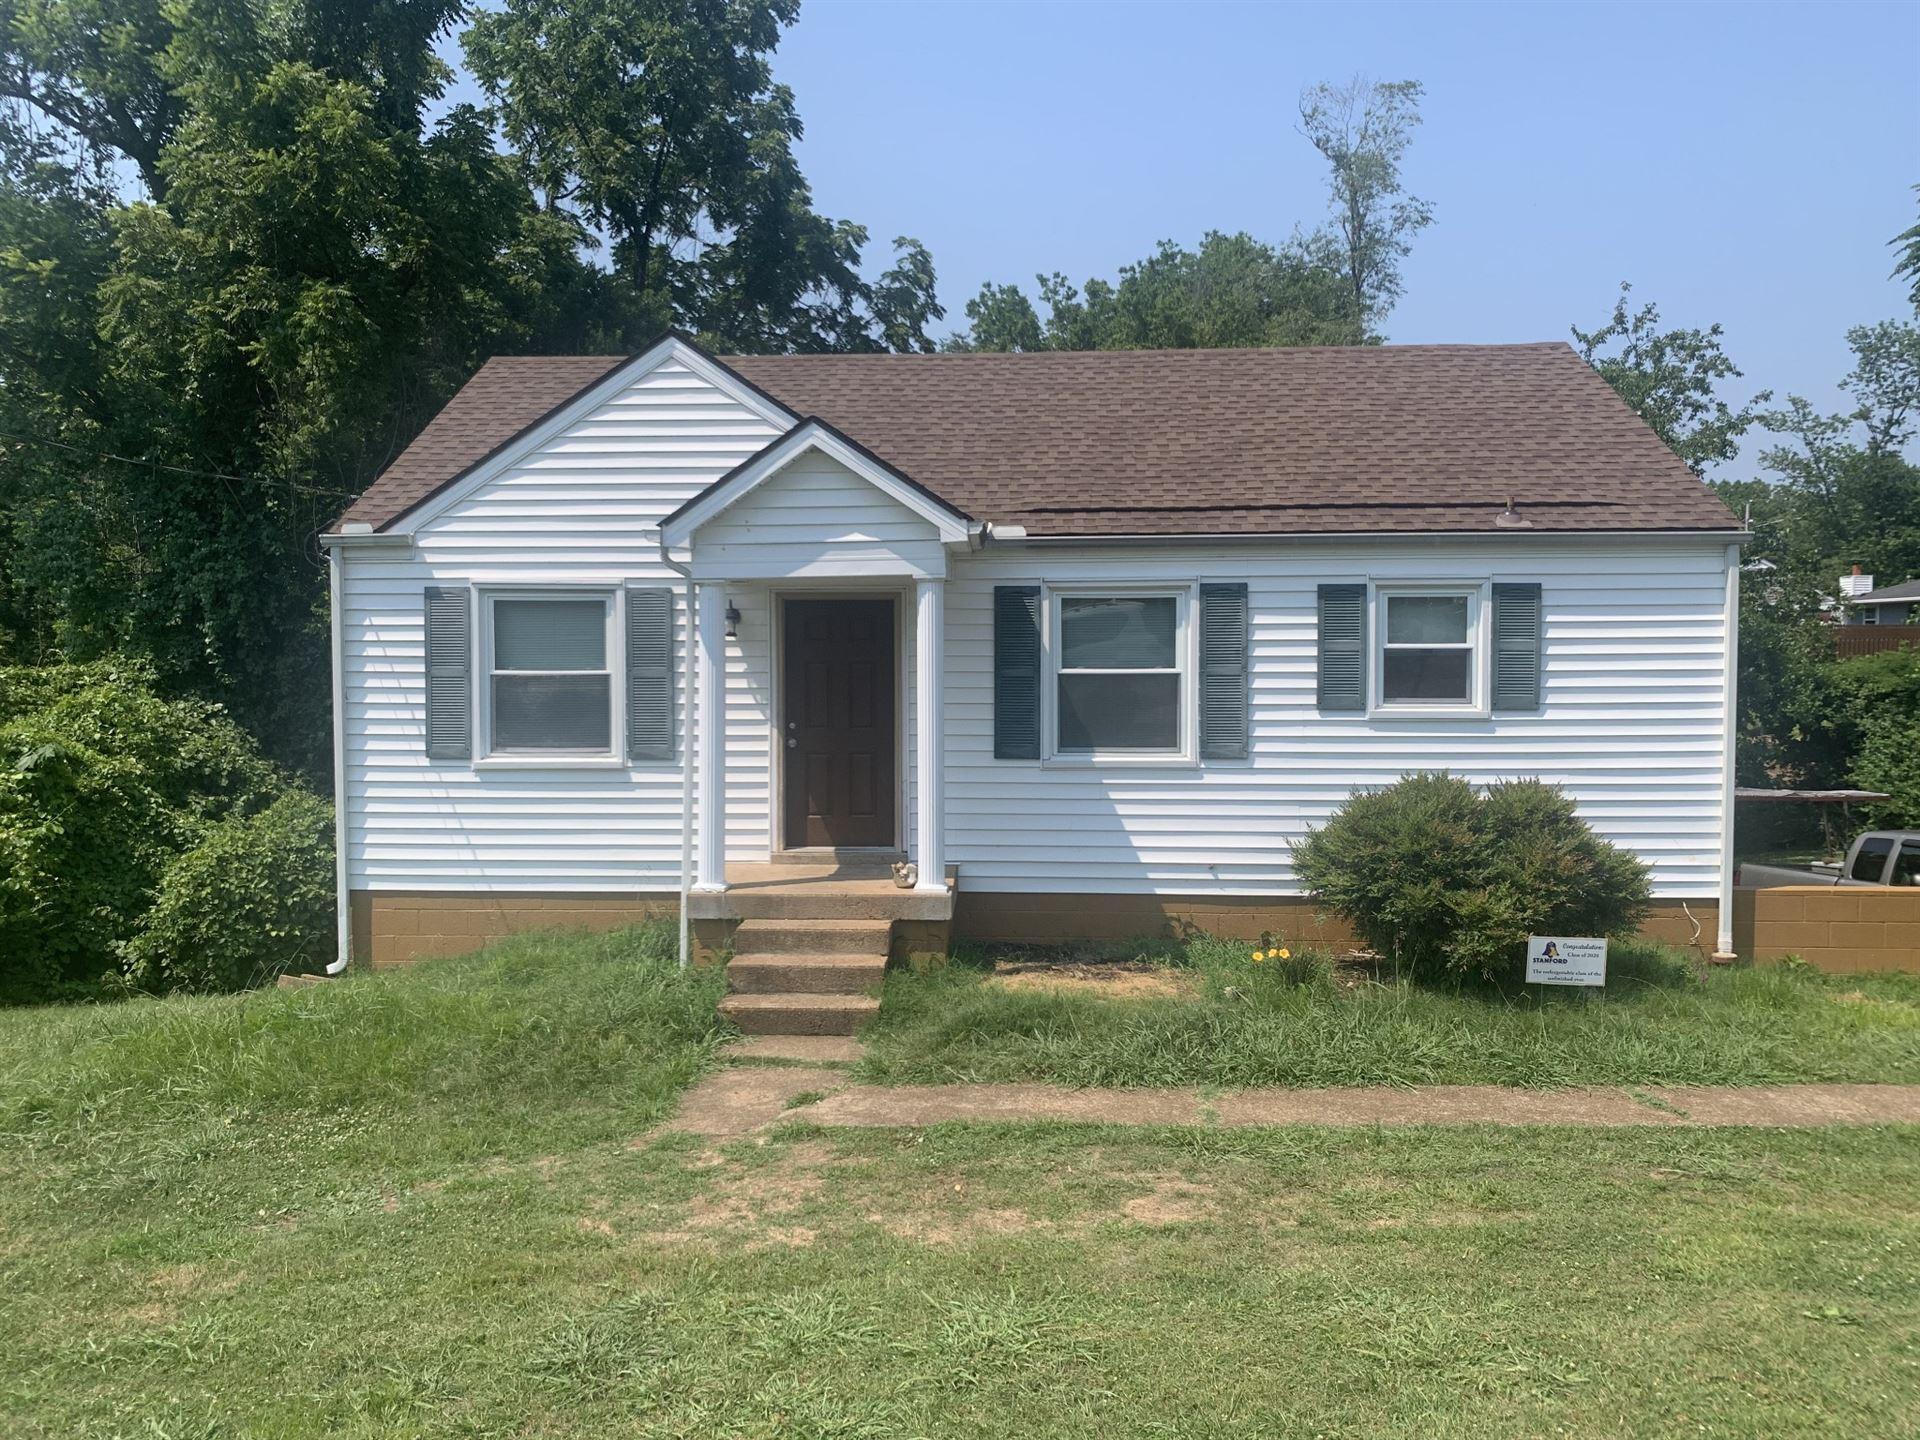 2236 Weona Dr, Nashville, TN 37214 - MLS#: 2269985